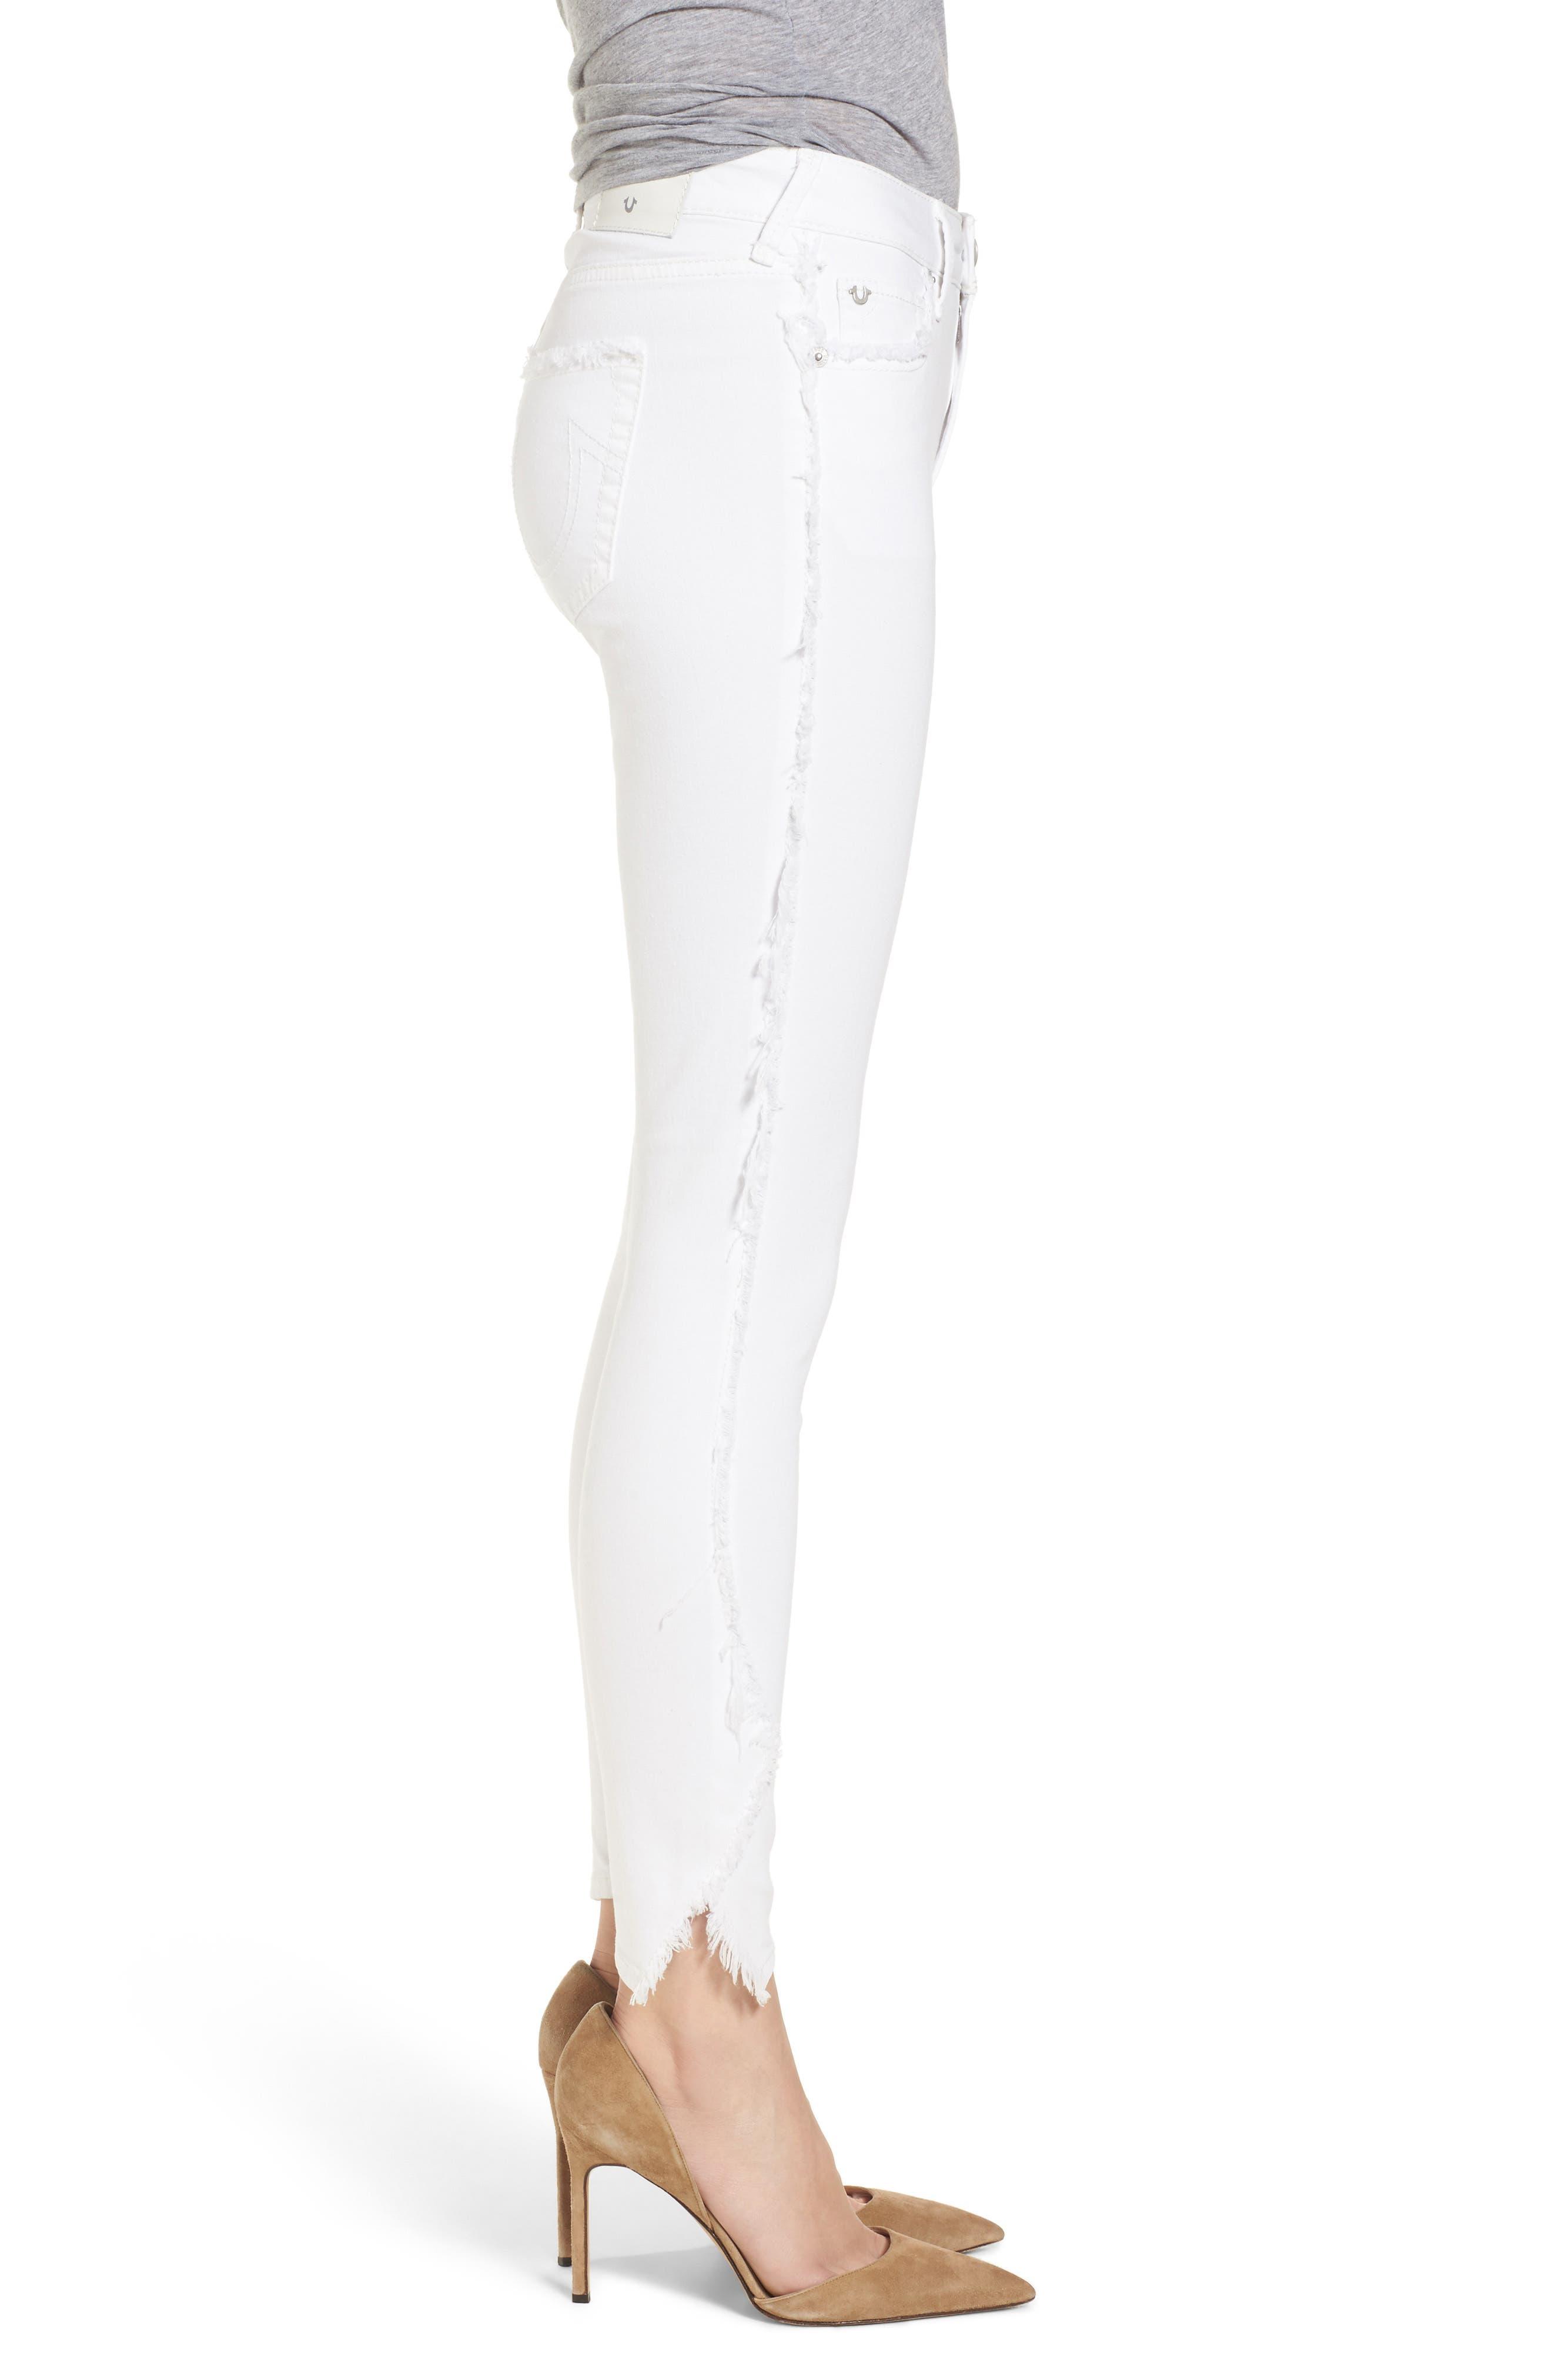 Jennie Curvy Skinny Jeans,                             Alternate thumbnail 3, color,                             Optic White